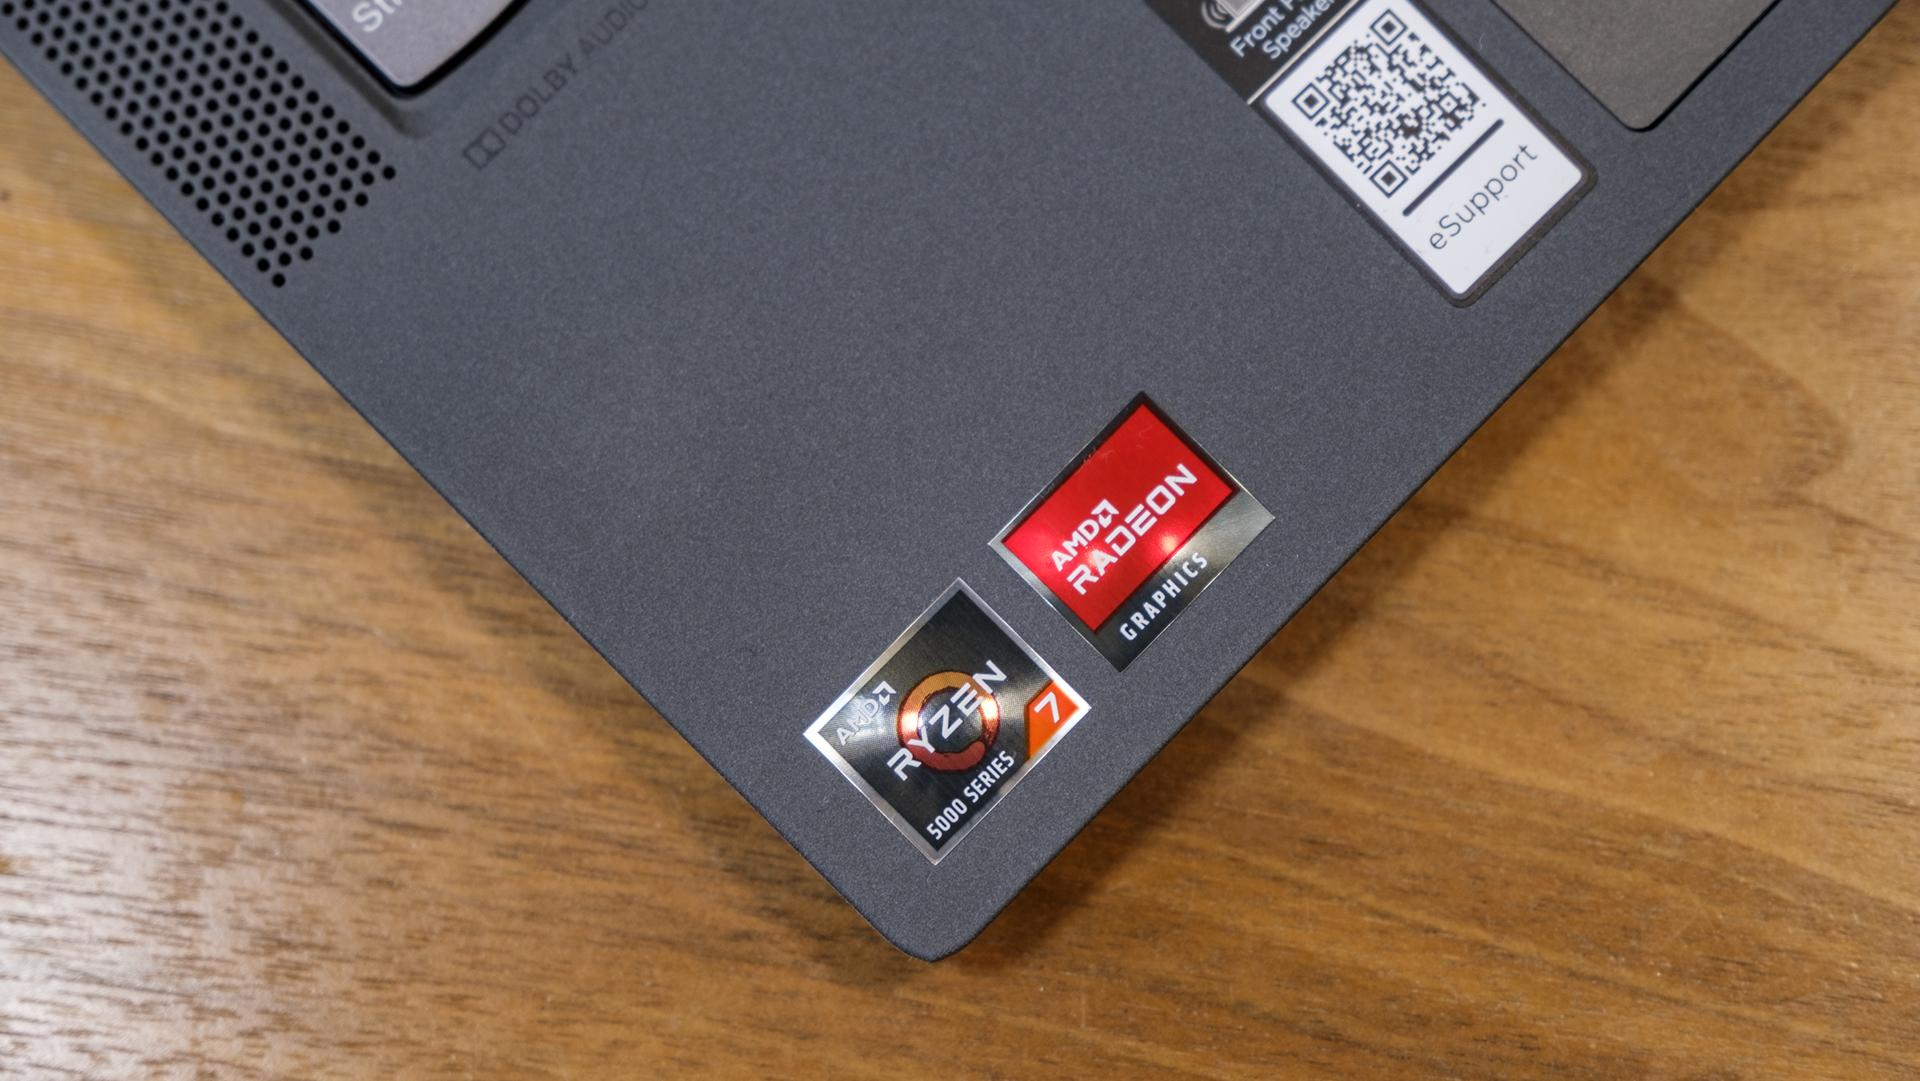 Lenovo IdeaPad Flex 5 AMD Ryzen 5700U Logo